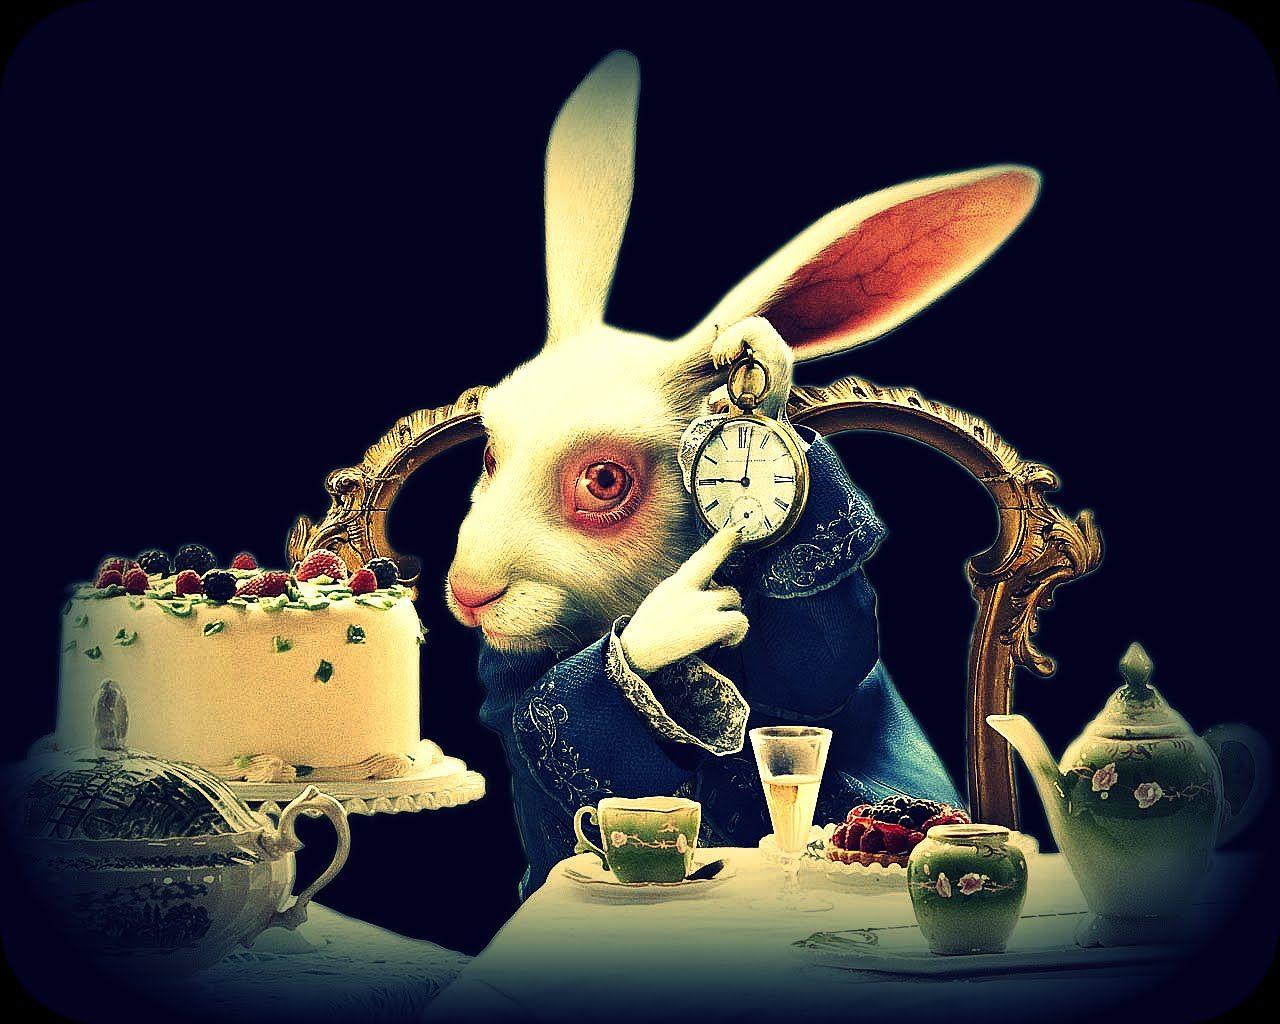 Белый кролик картинки алиса, солнечный привет картинка